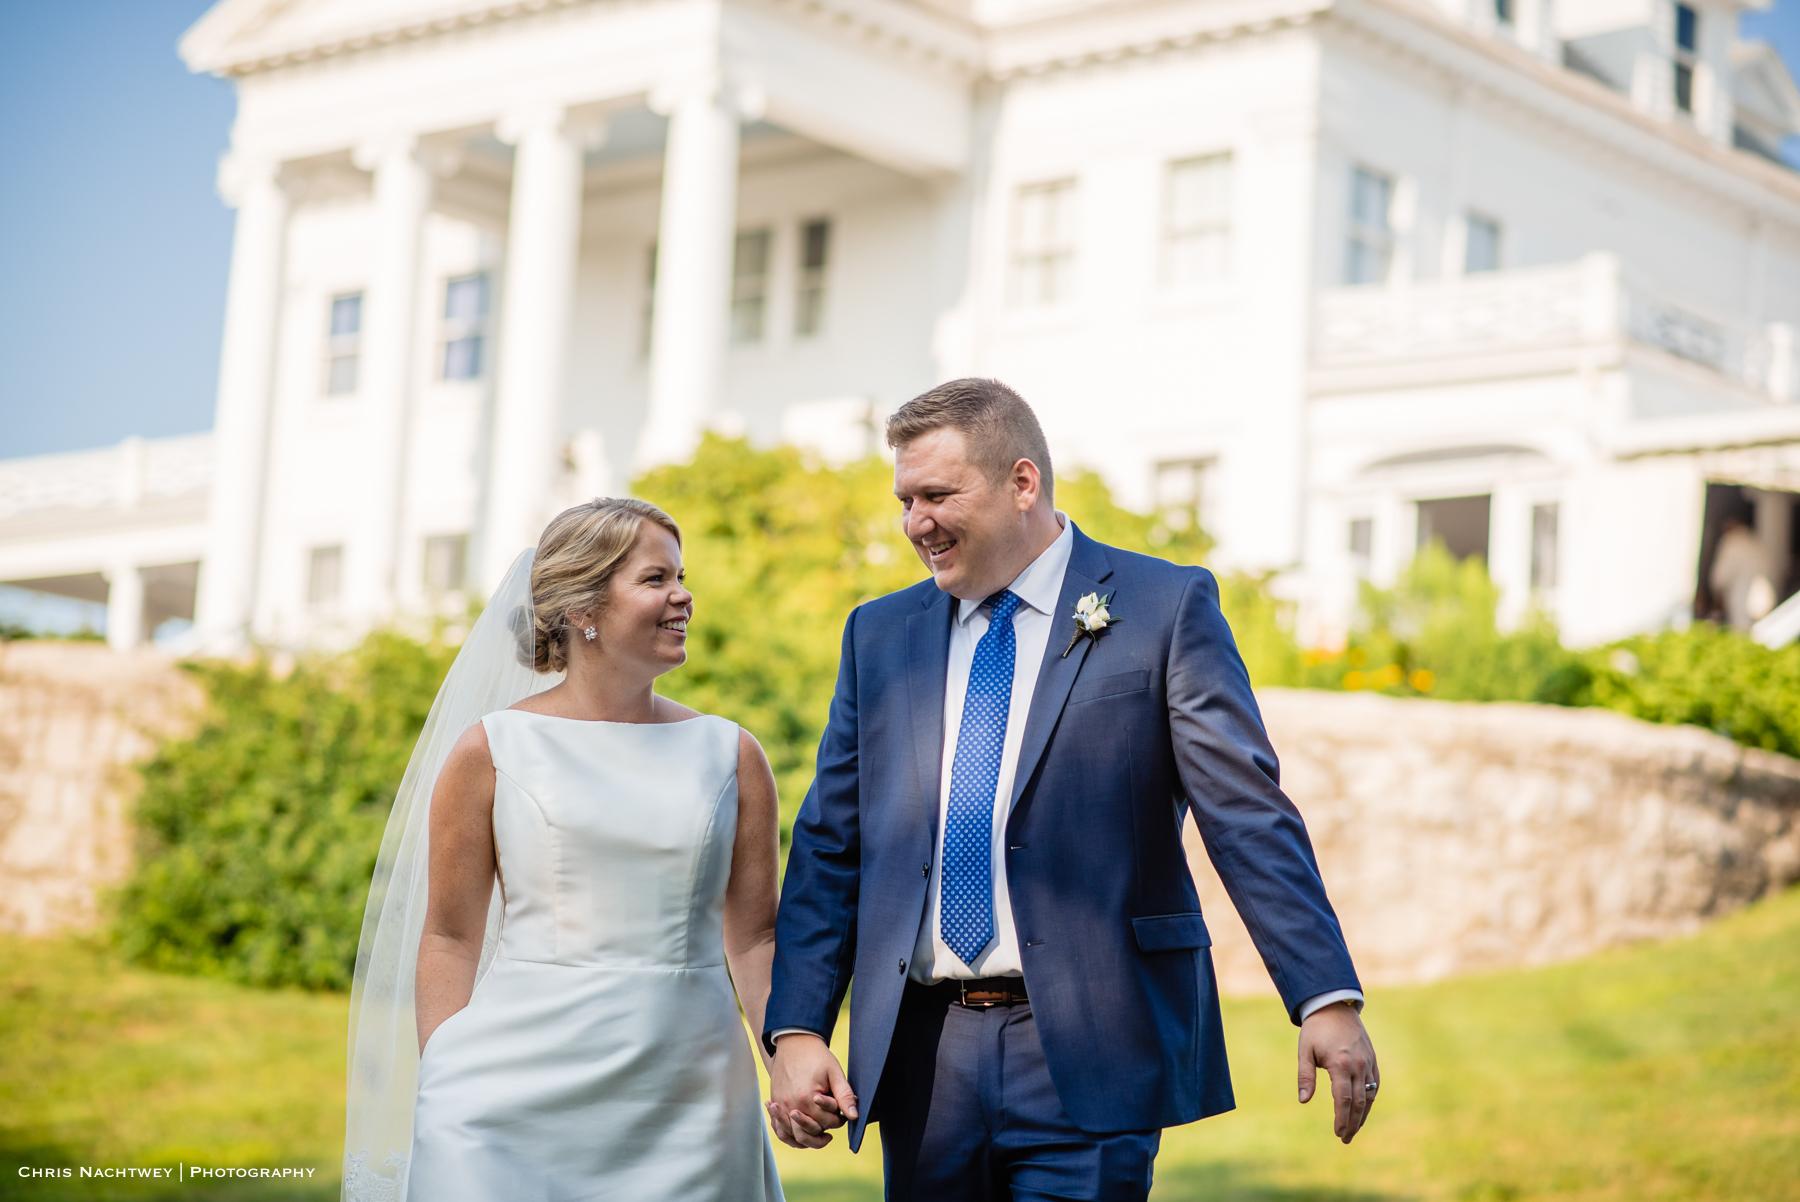 photos-wedding-haley-mansion-mystic-ct-chris-nachtwey-photography-2019-27.jpg